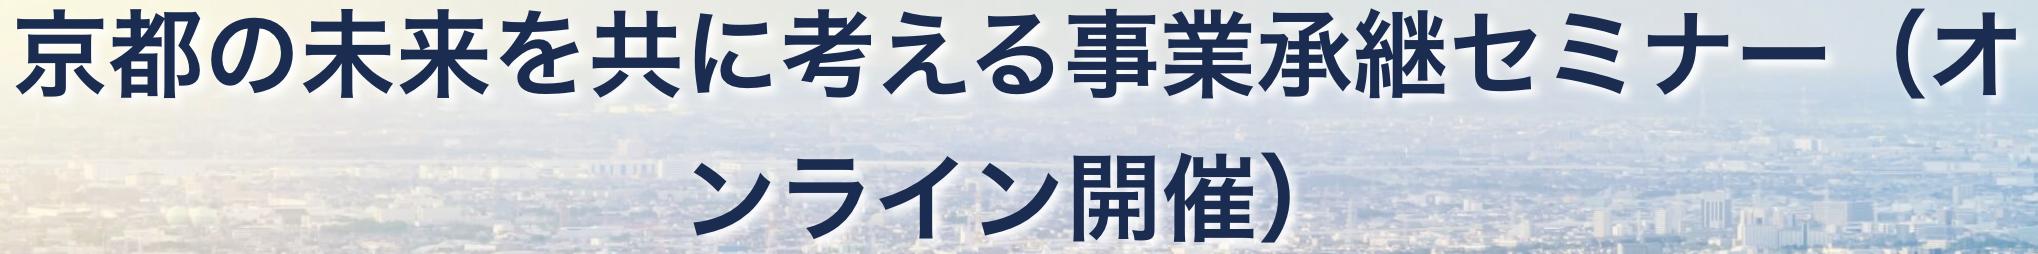 バトンズ、(公財)京都産業21、京都府共催 事業承継セミナー開催